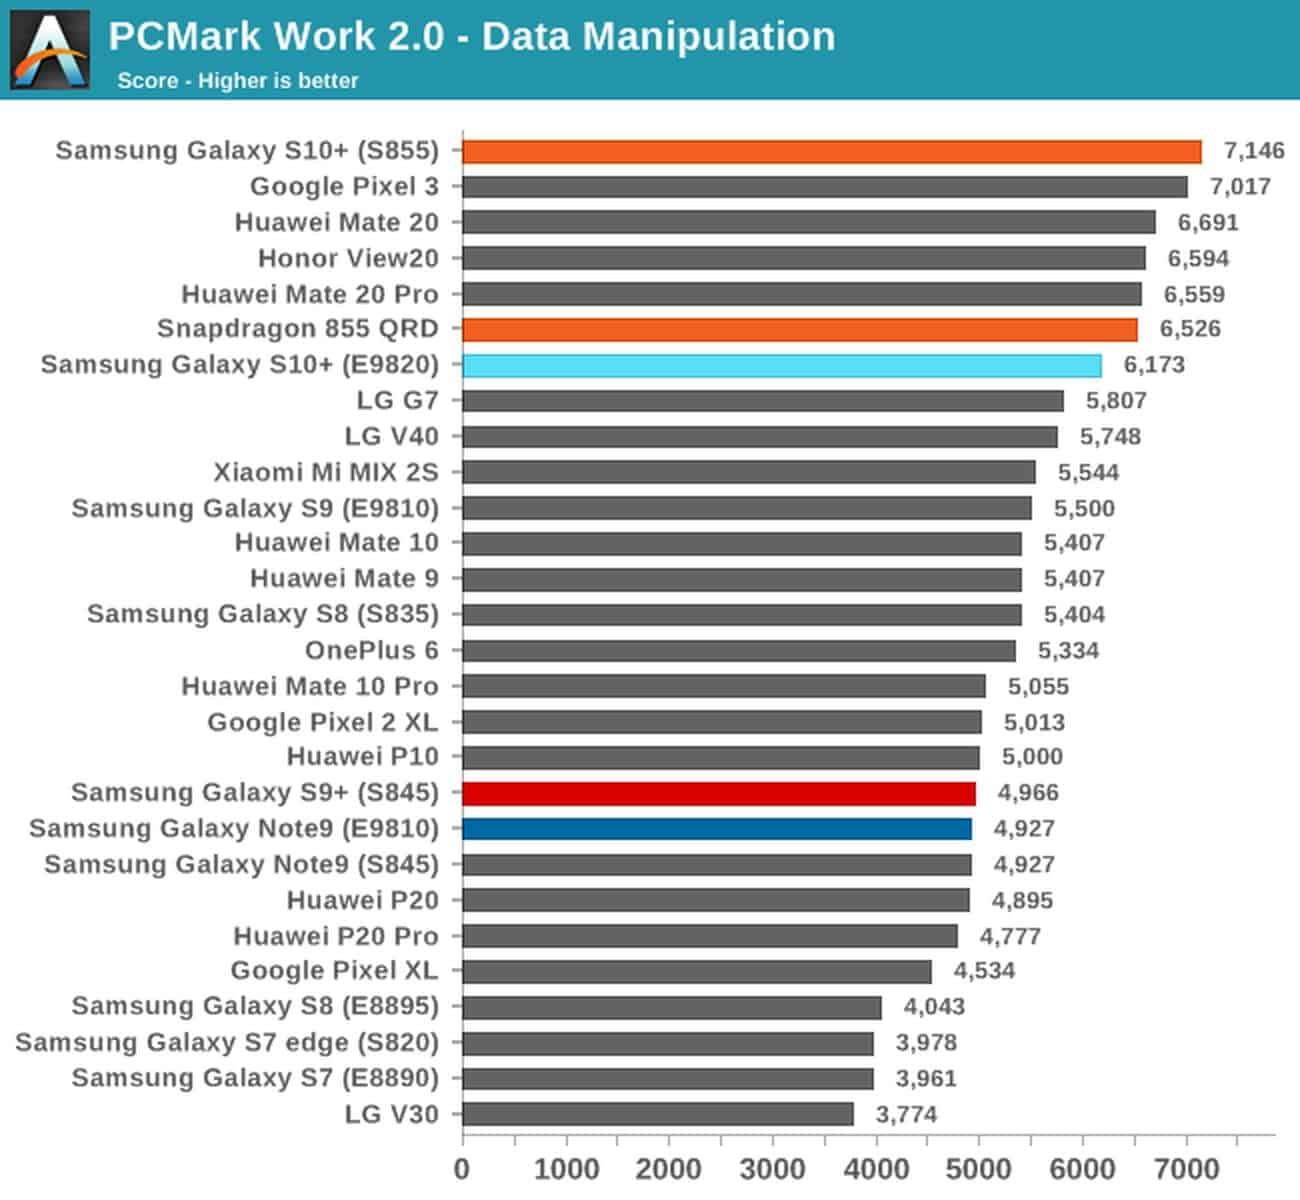 PCMark Galaxy S10 both SoC variants 5